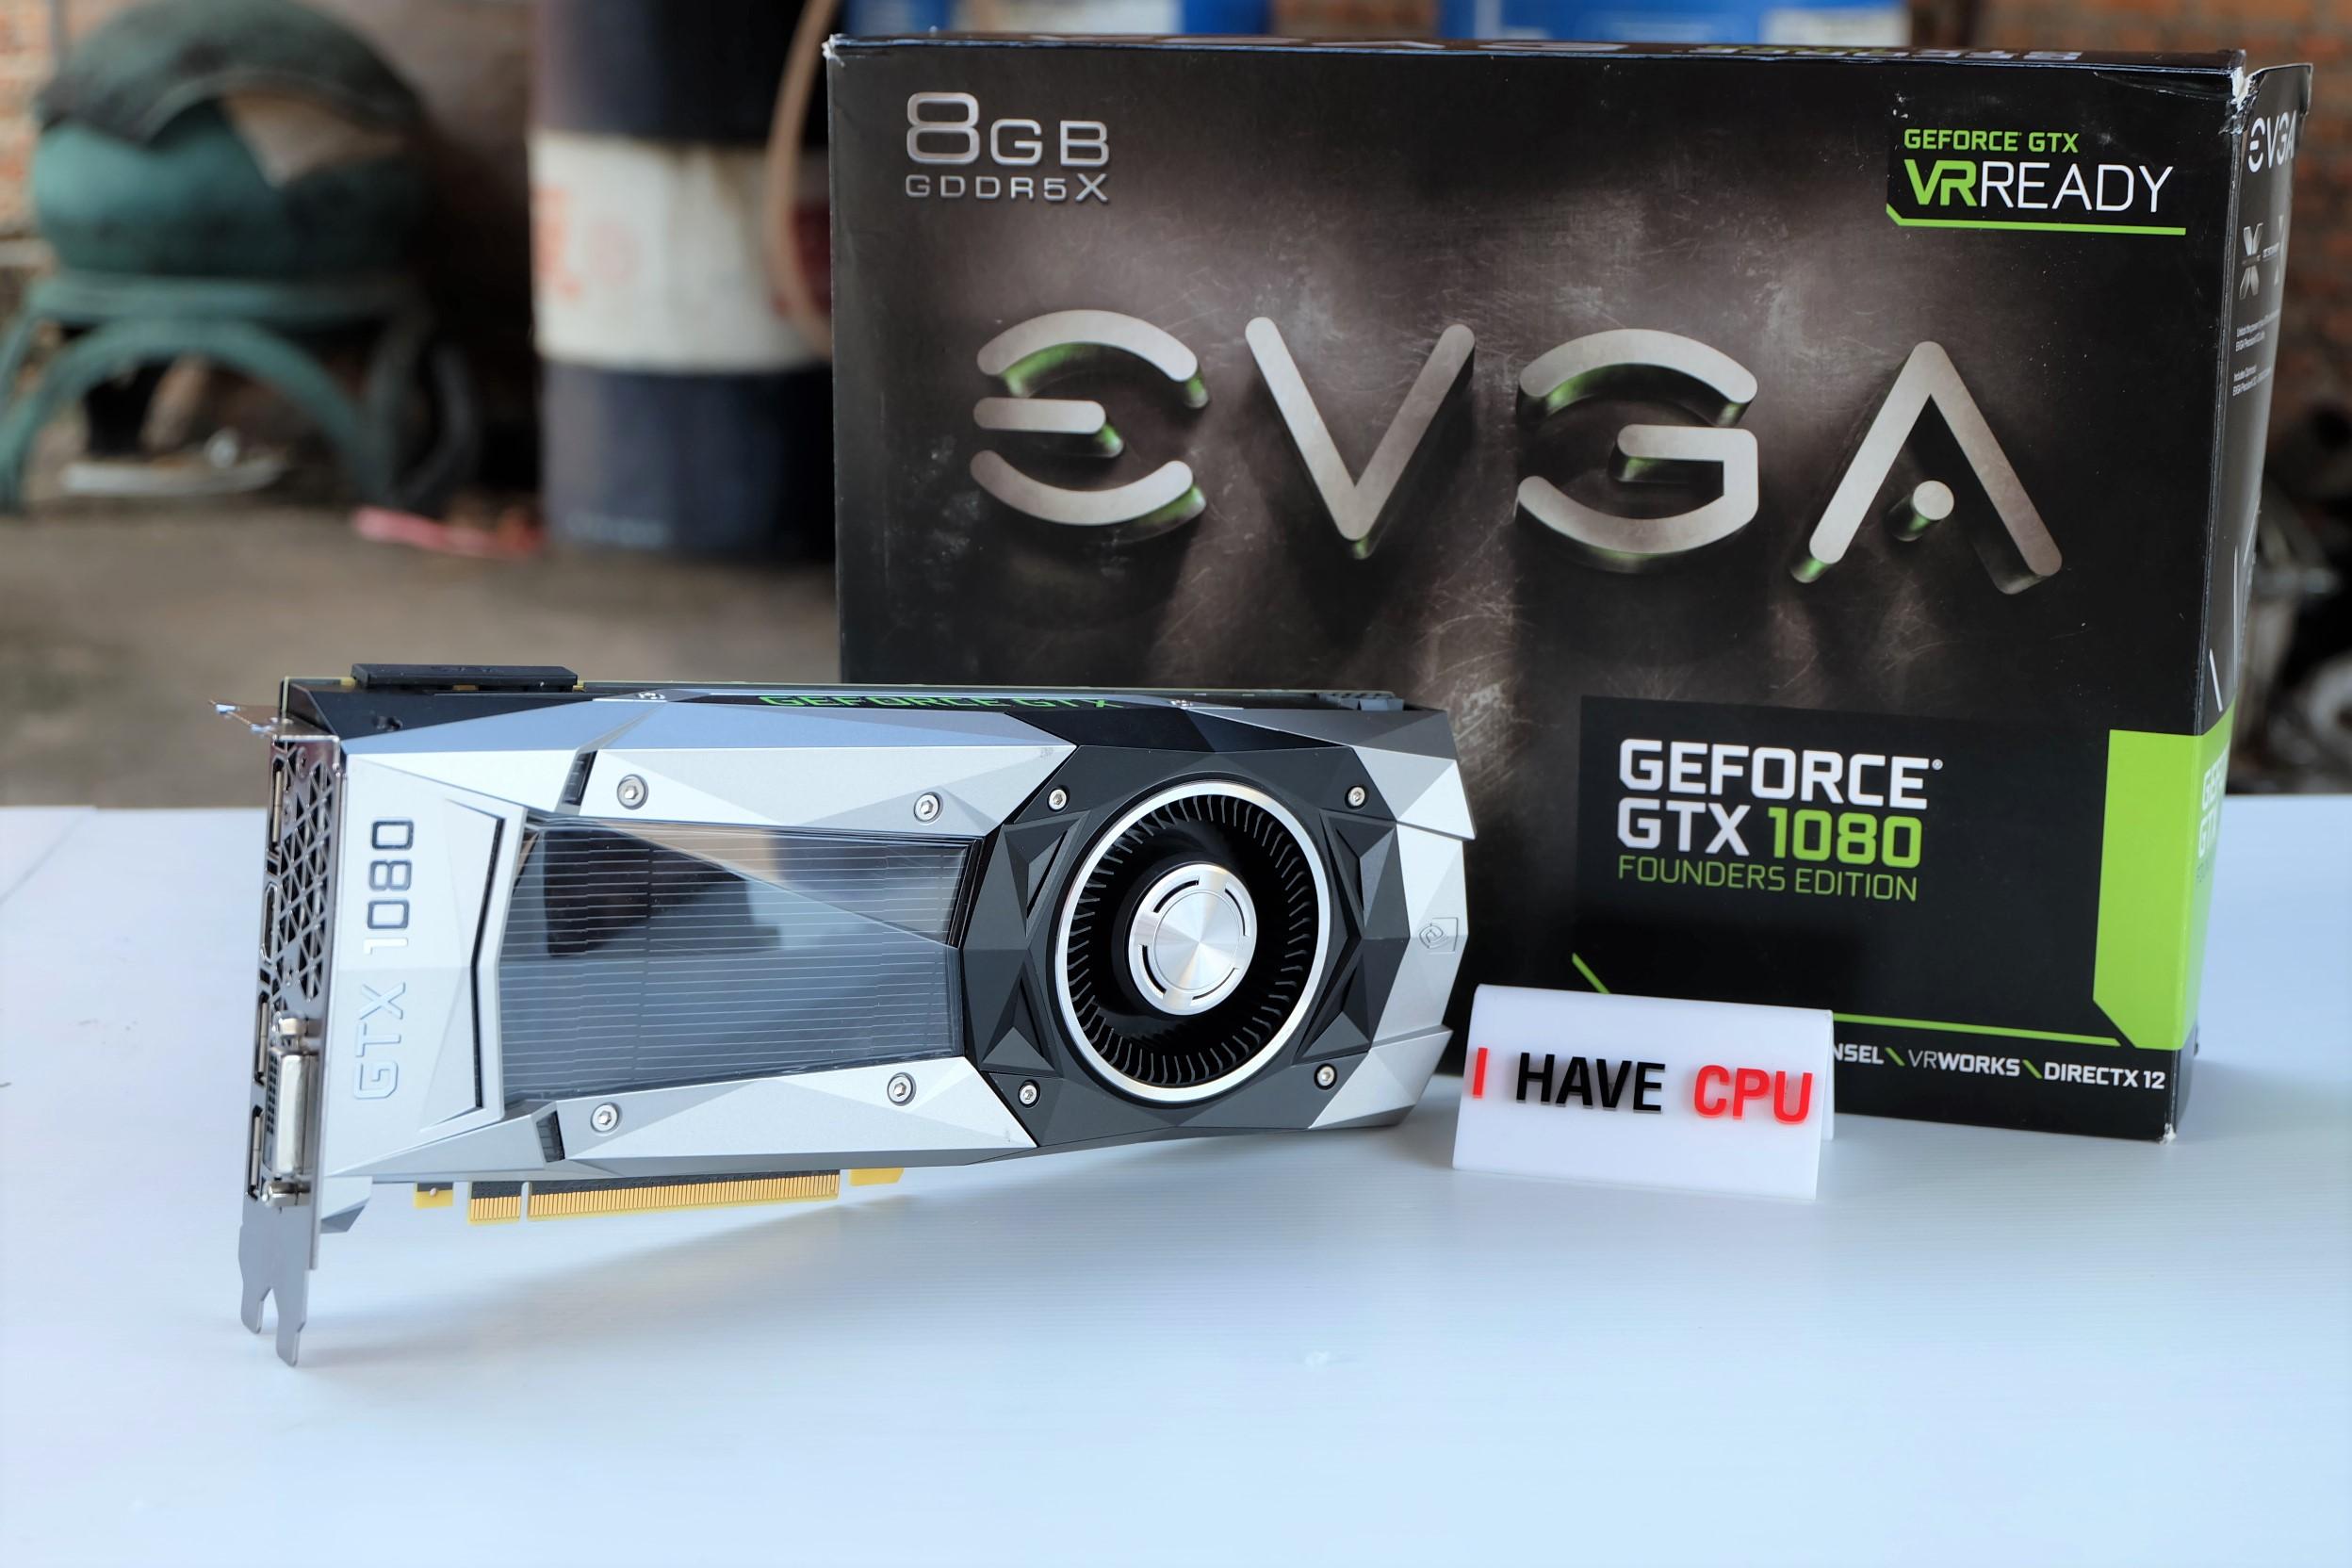 EVGA GTX 1080 8GB GDDR5X FE